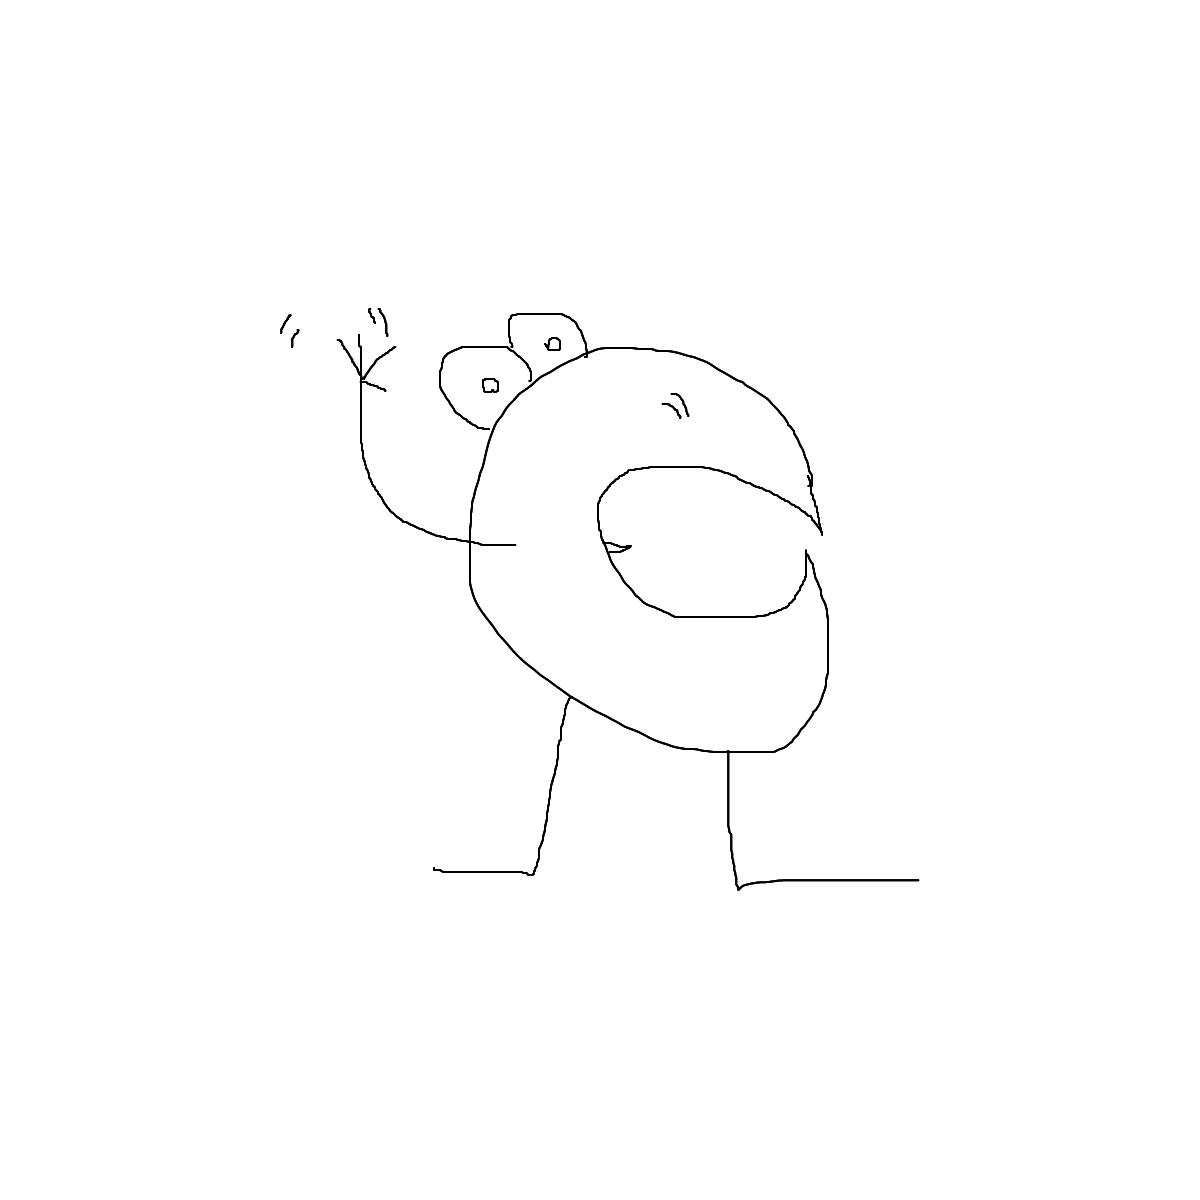 BAAAM drawing#12630 lat:83.6608428955078100lng: -33.3754272460937500